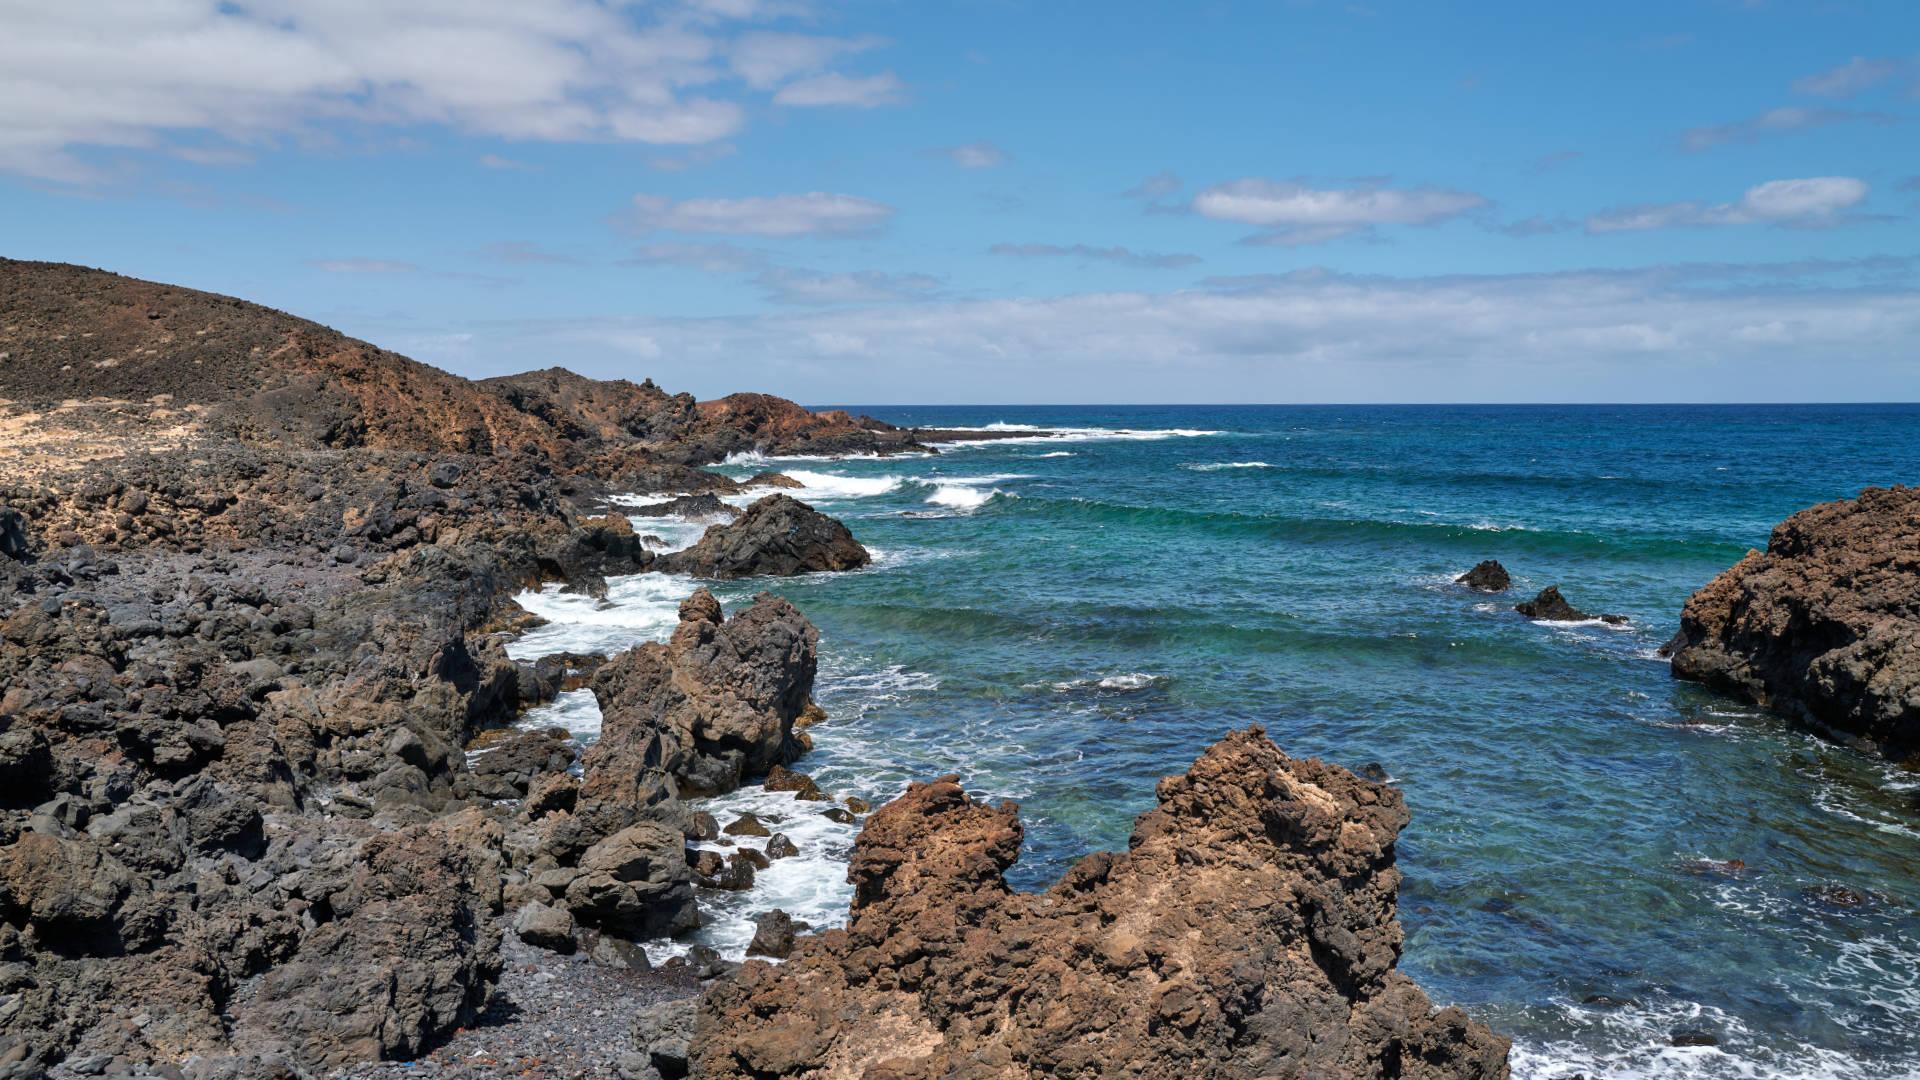 Caleta del Vino Isla de Lobos Fuerteventura.